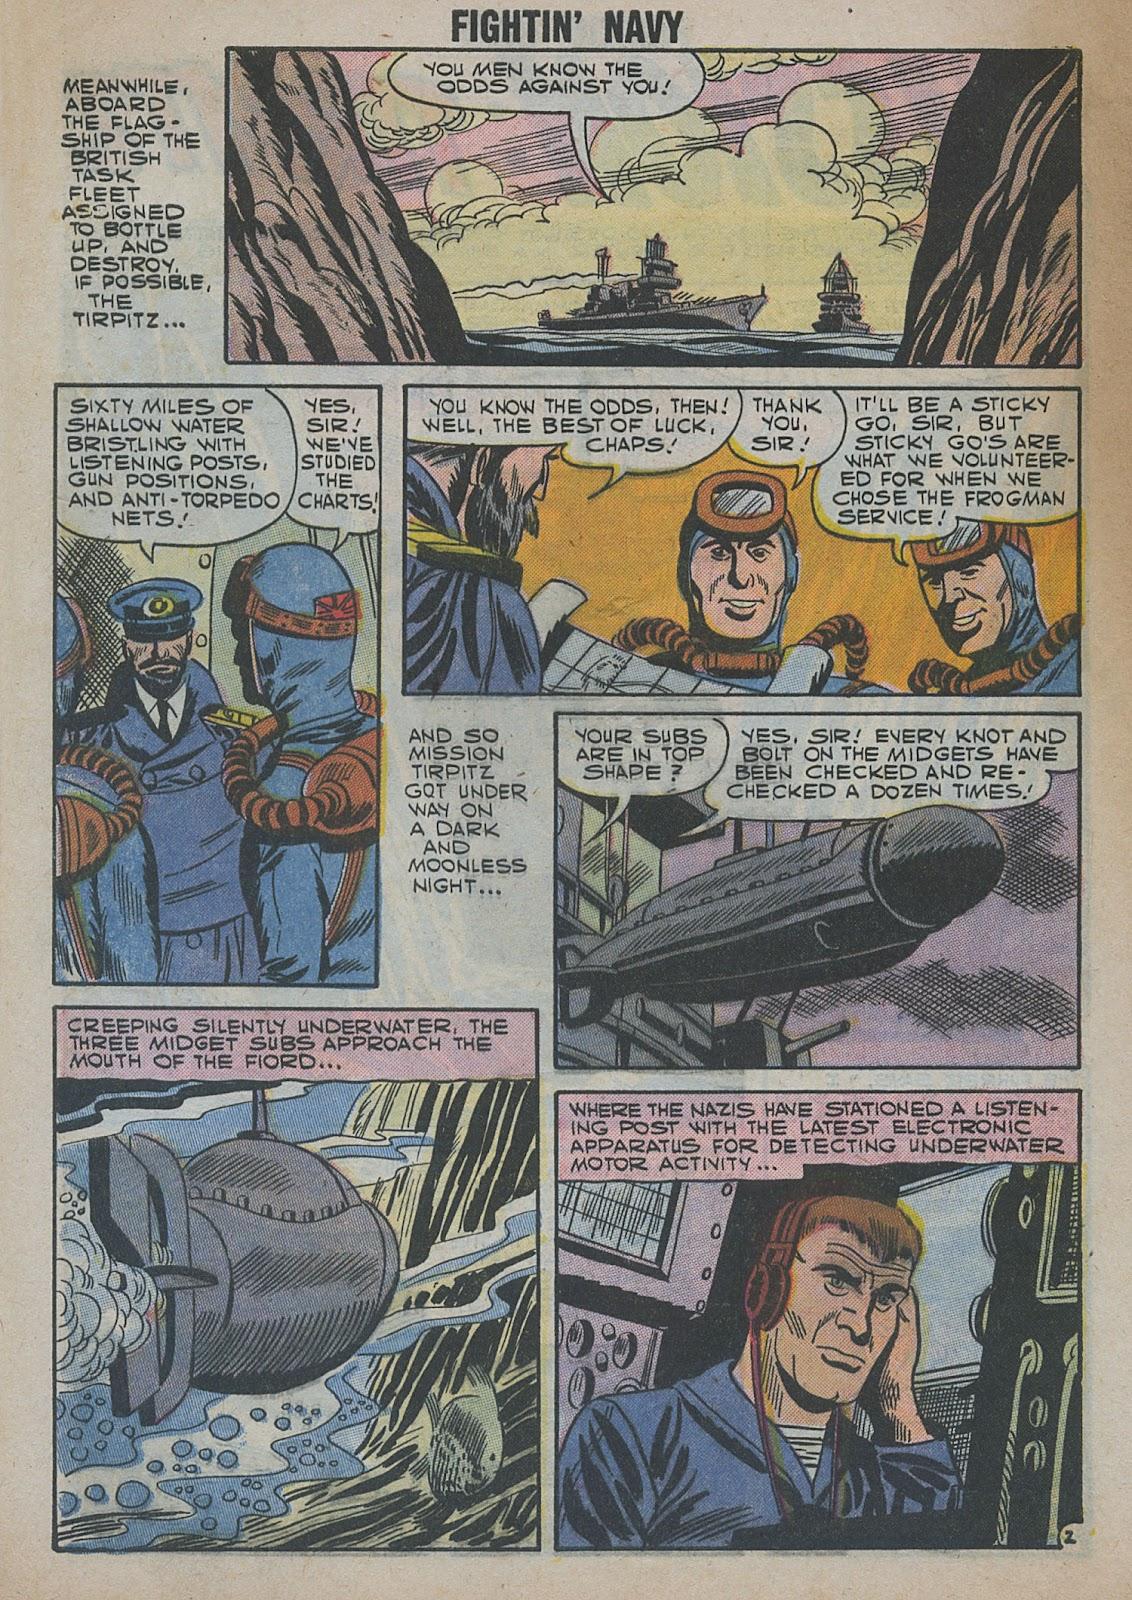 Read online Fightin' Navy comic -  Issue #82 - 60